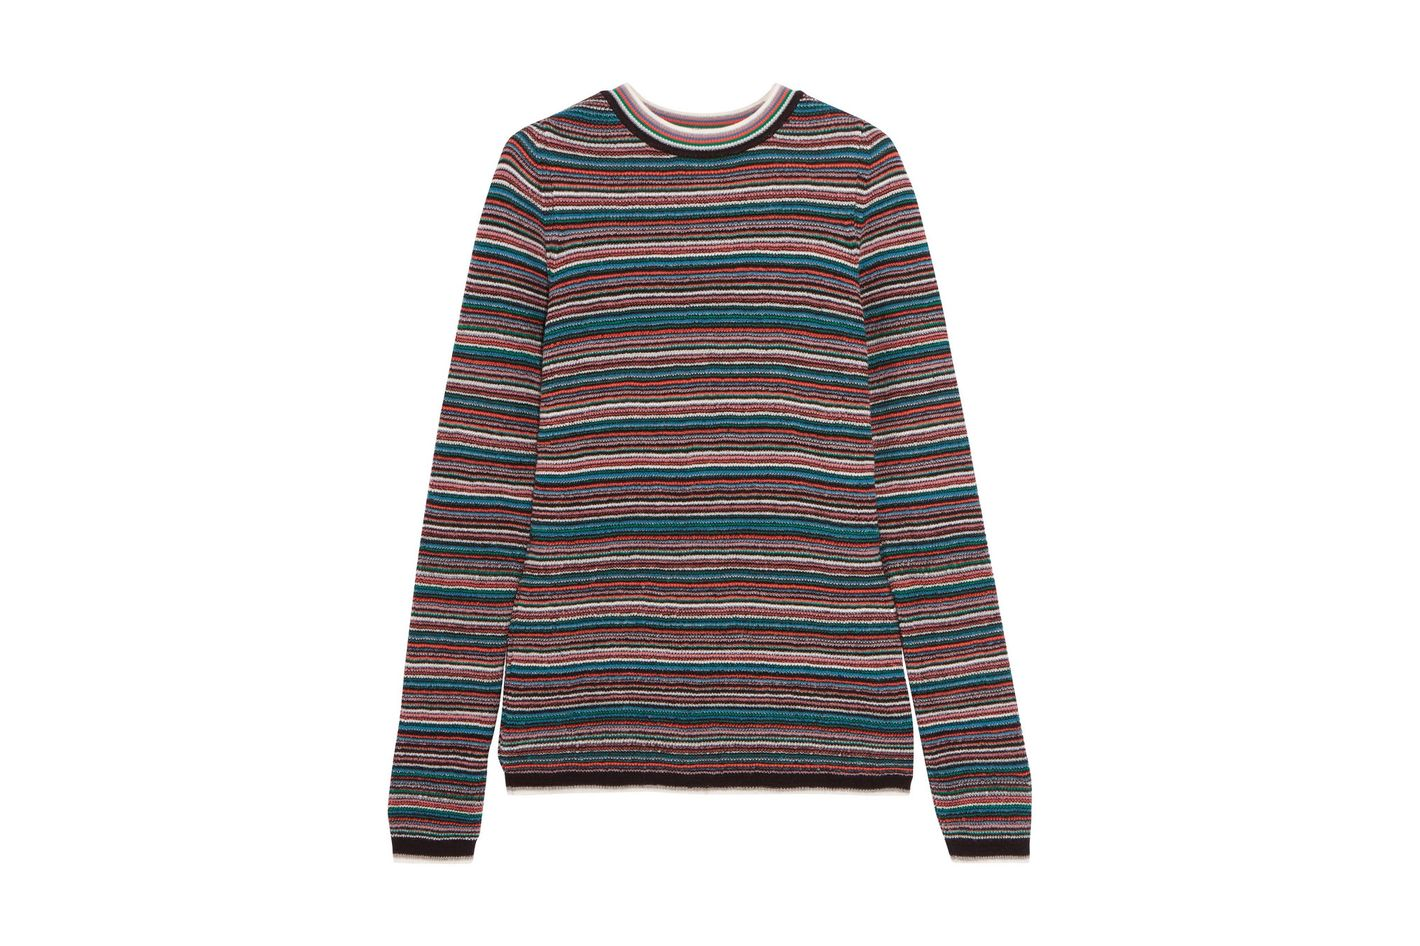 M.I.H JEANS Moonie striped merino wool sweater